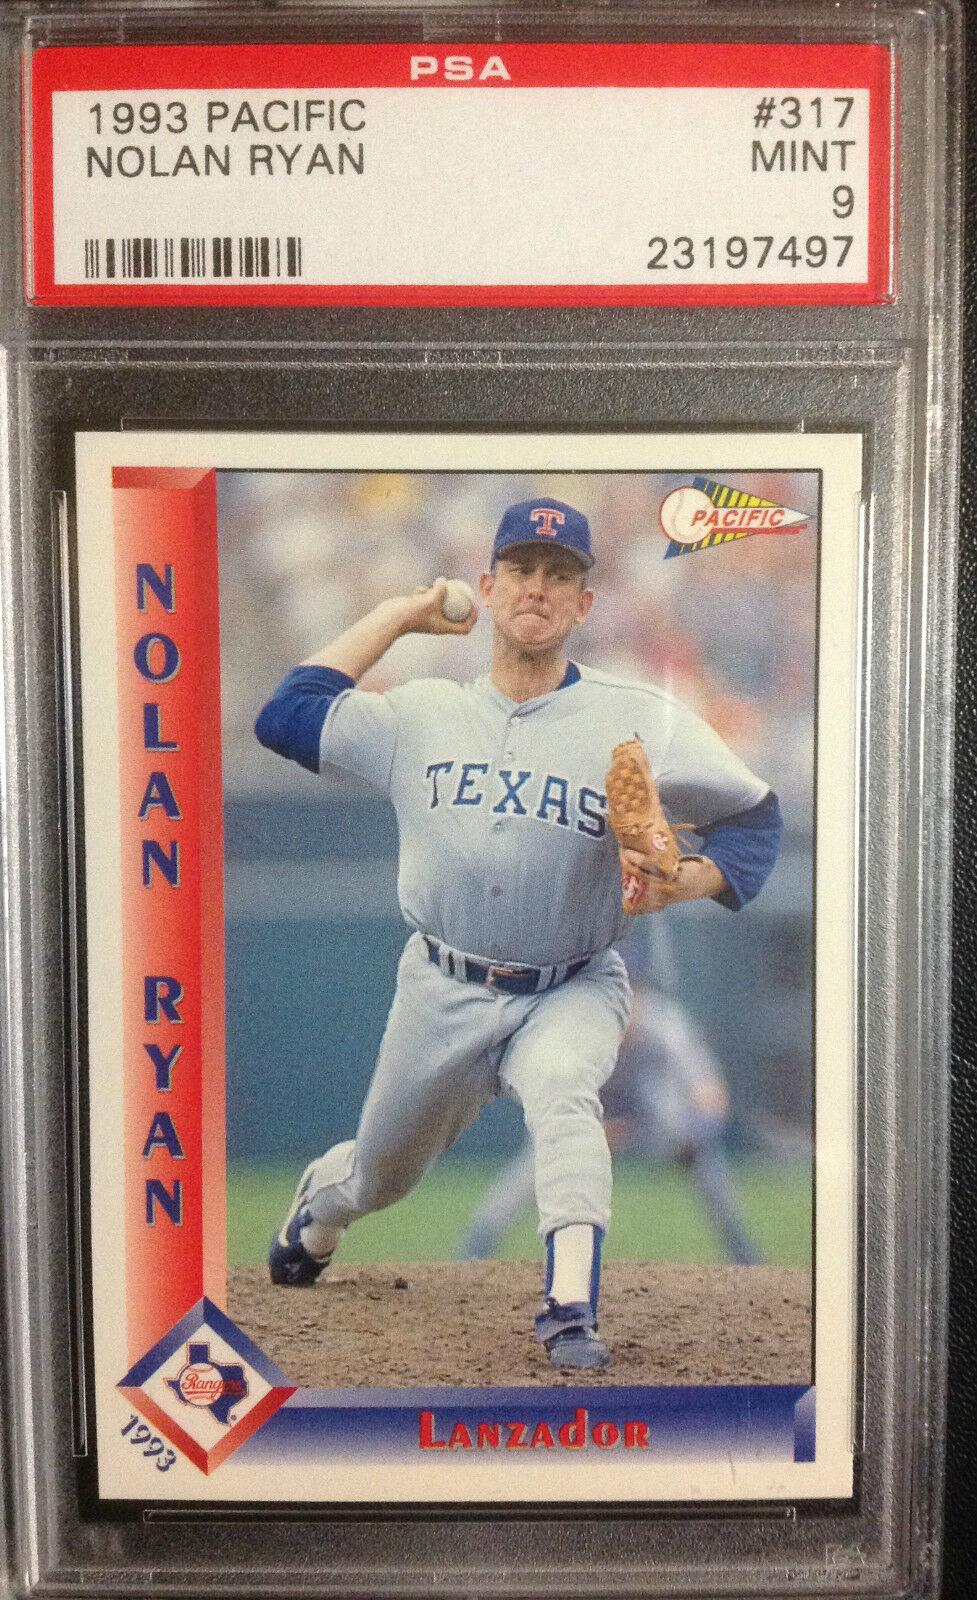 1993 Pacific Spanish Nolan Ryan Texas Rangers 317 Baseball Card